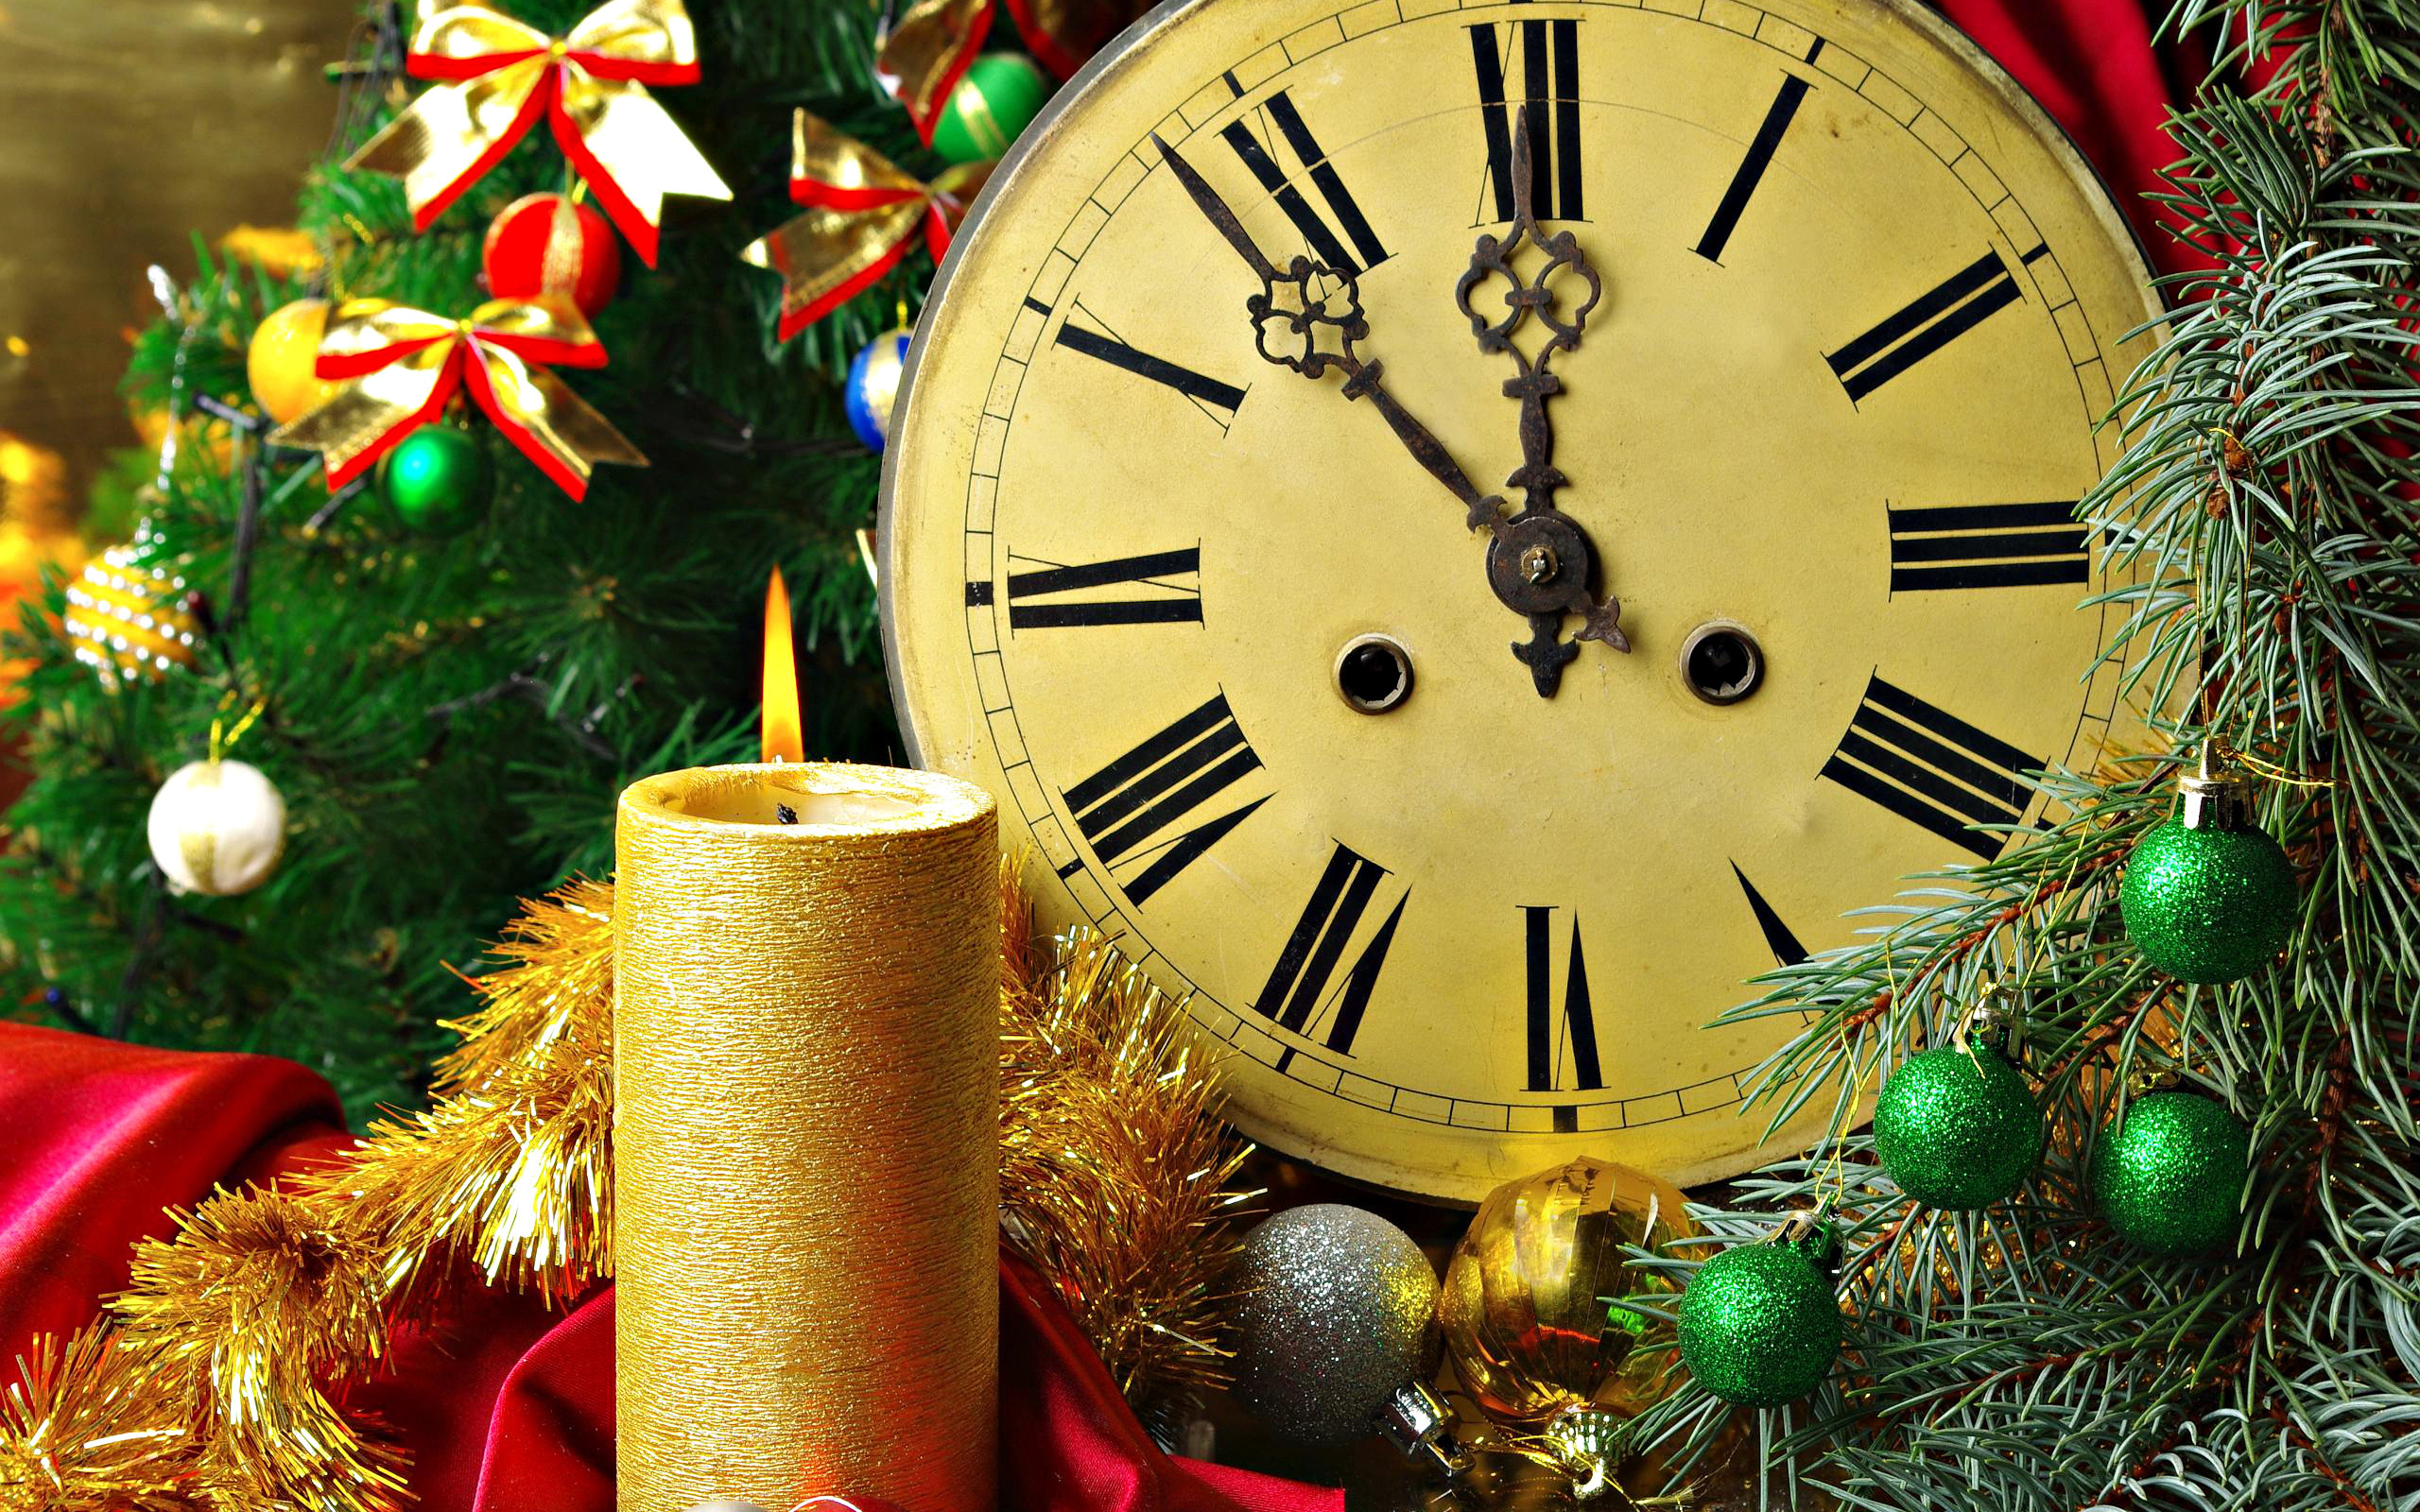 Куда съездить на Новый Год? Несколько ...: robinzon.ru/blog/poleznye-sovety/kuda-sezdit-na-novyj-god-neskolko...